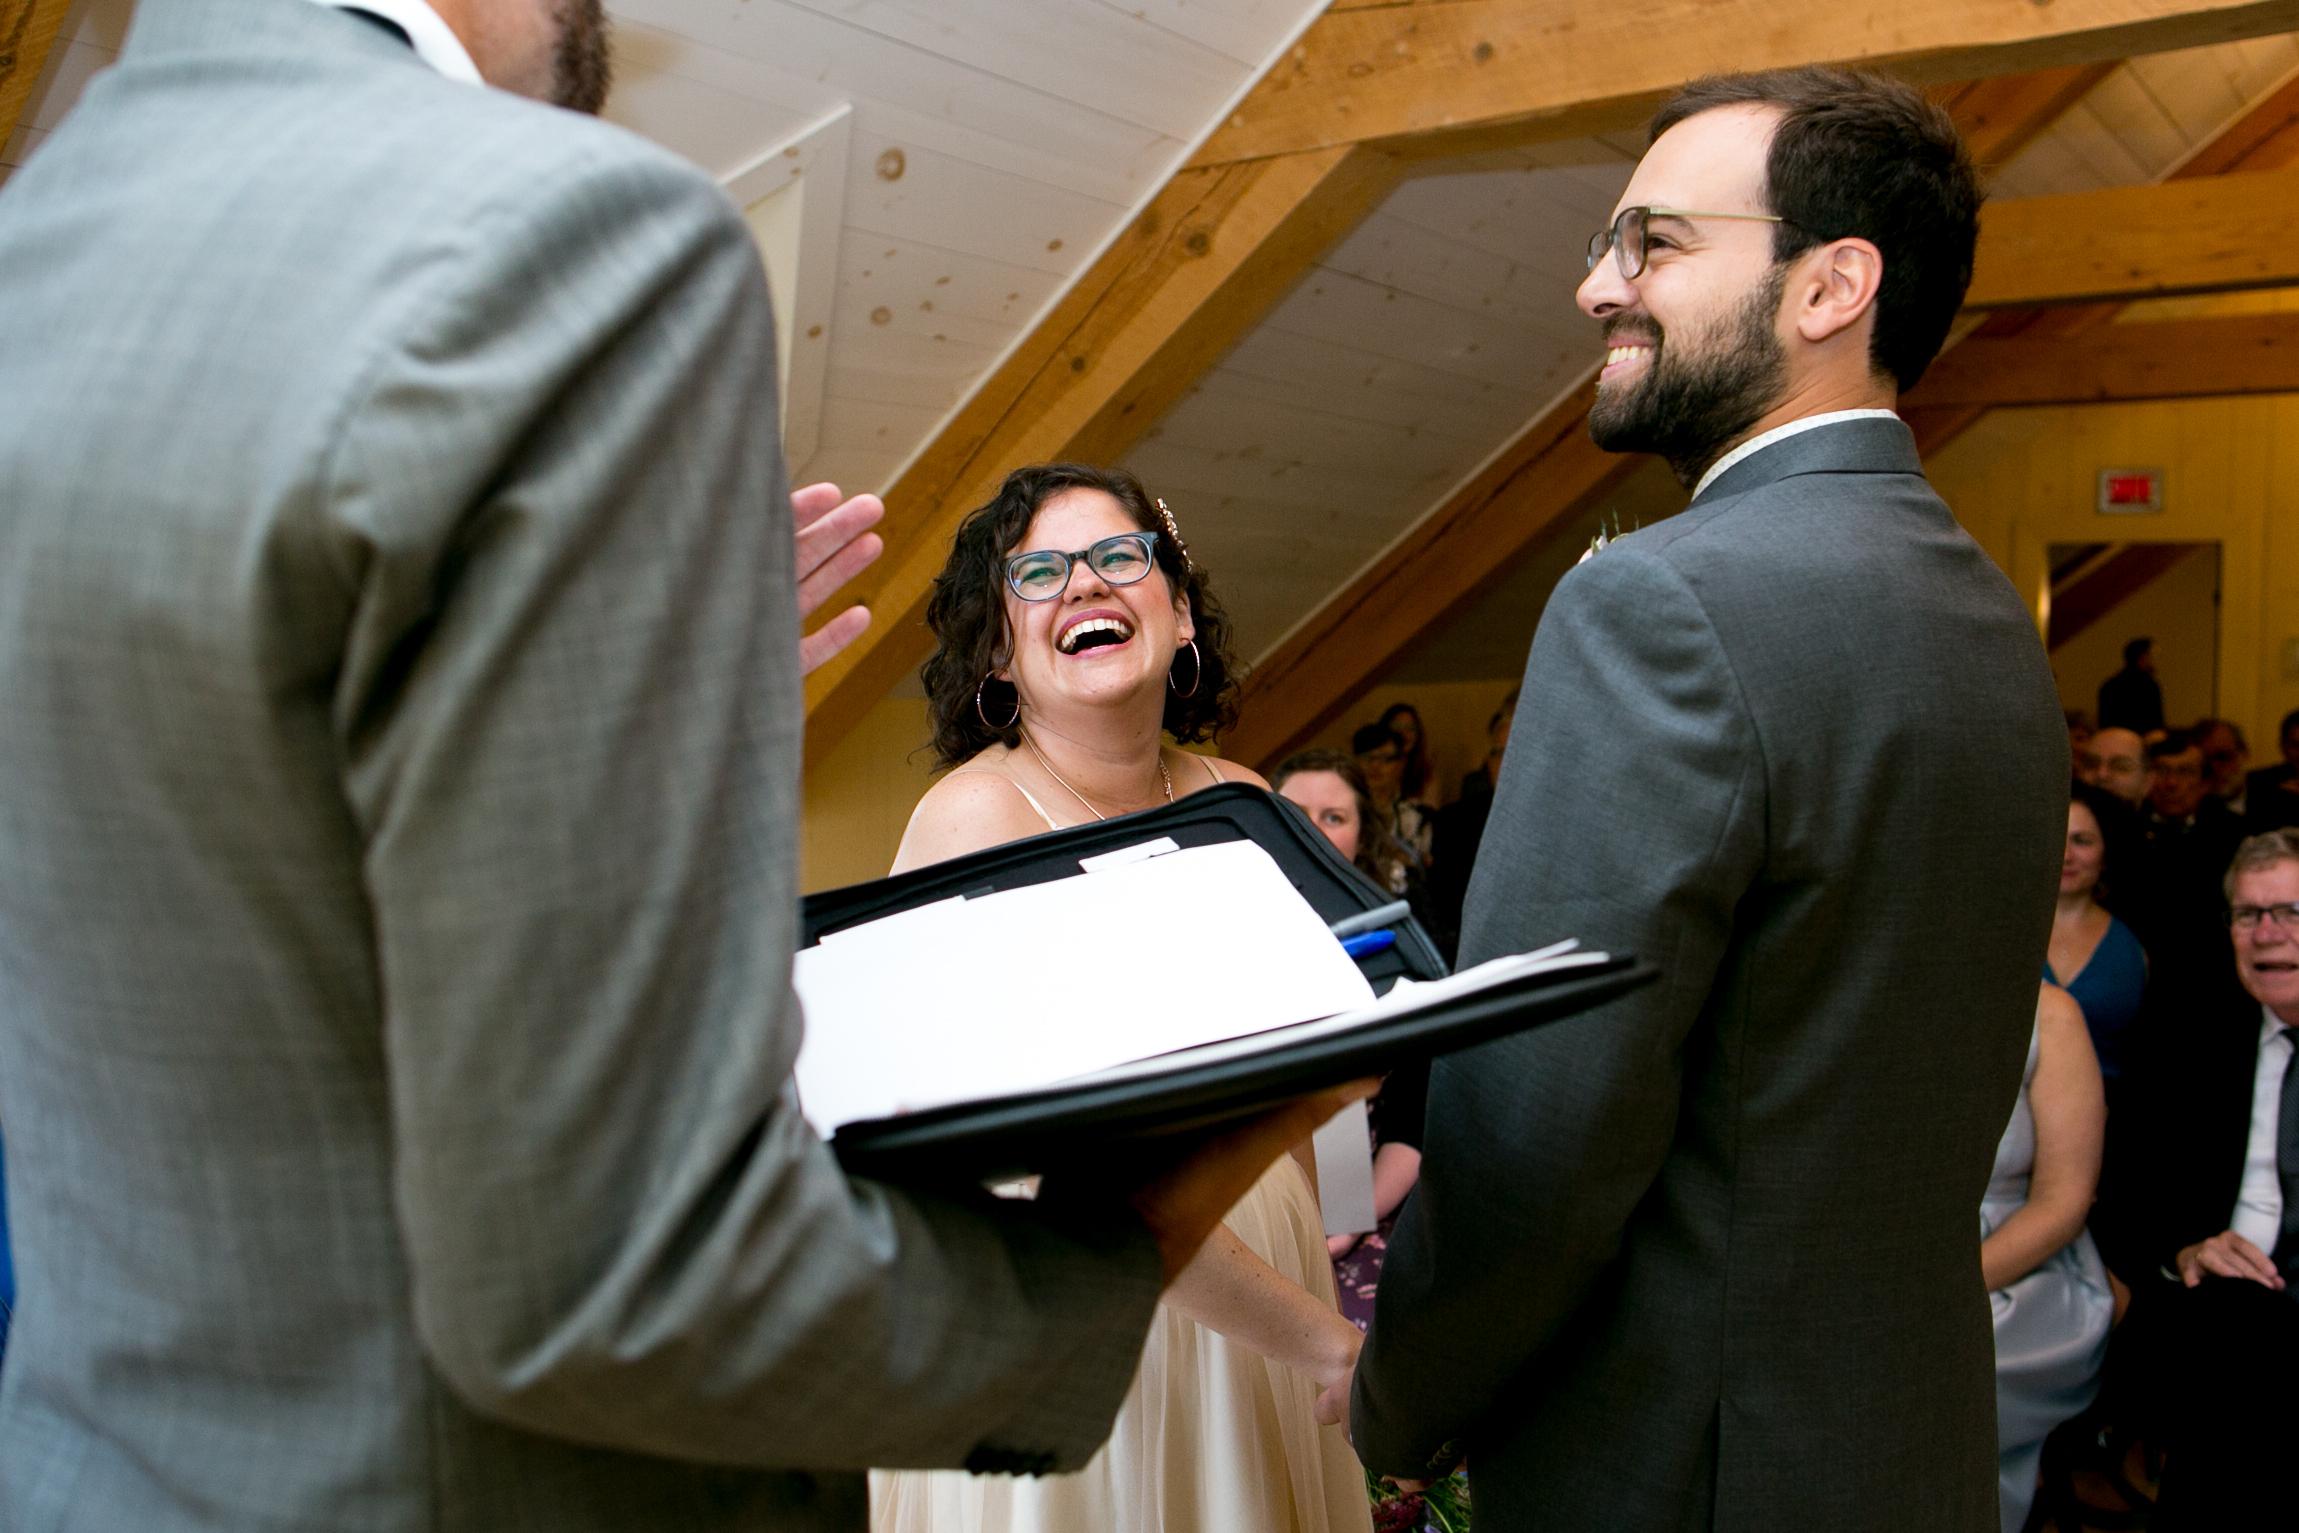 wedding pictures-348.jpg